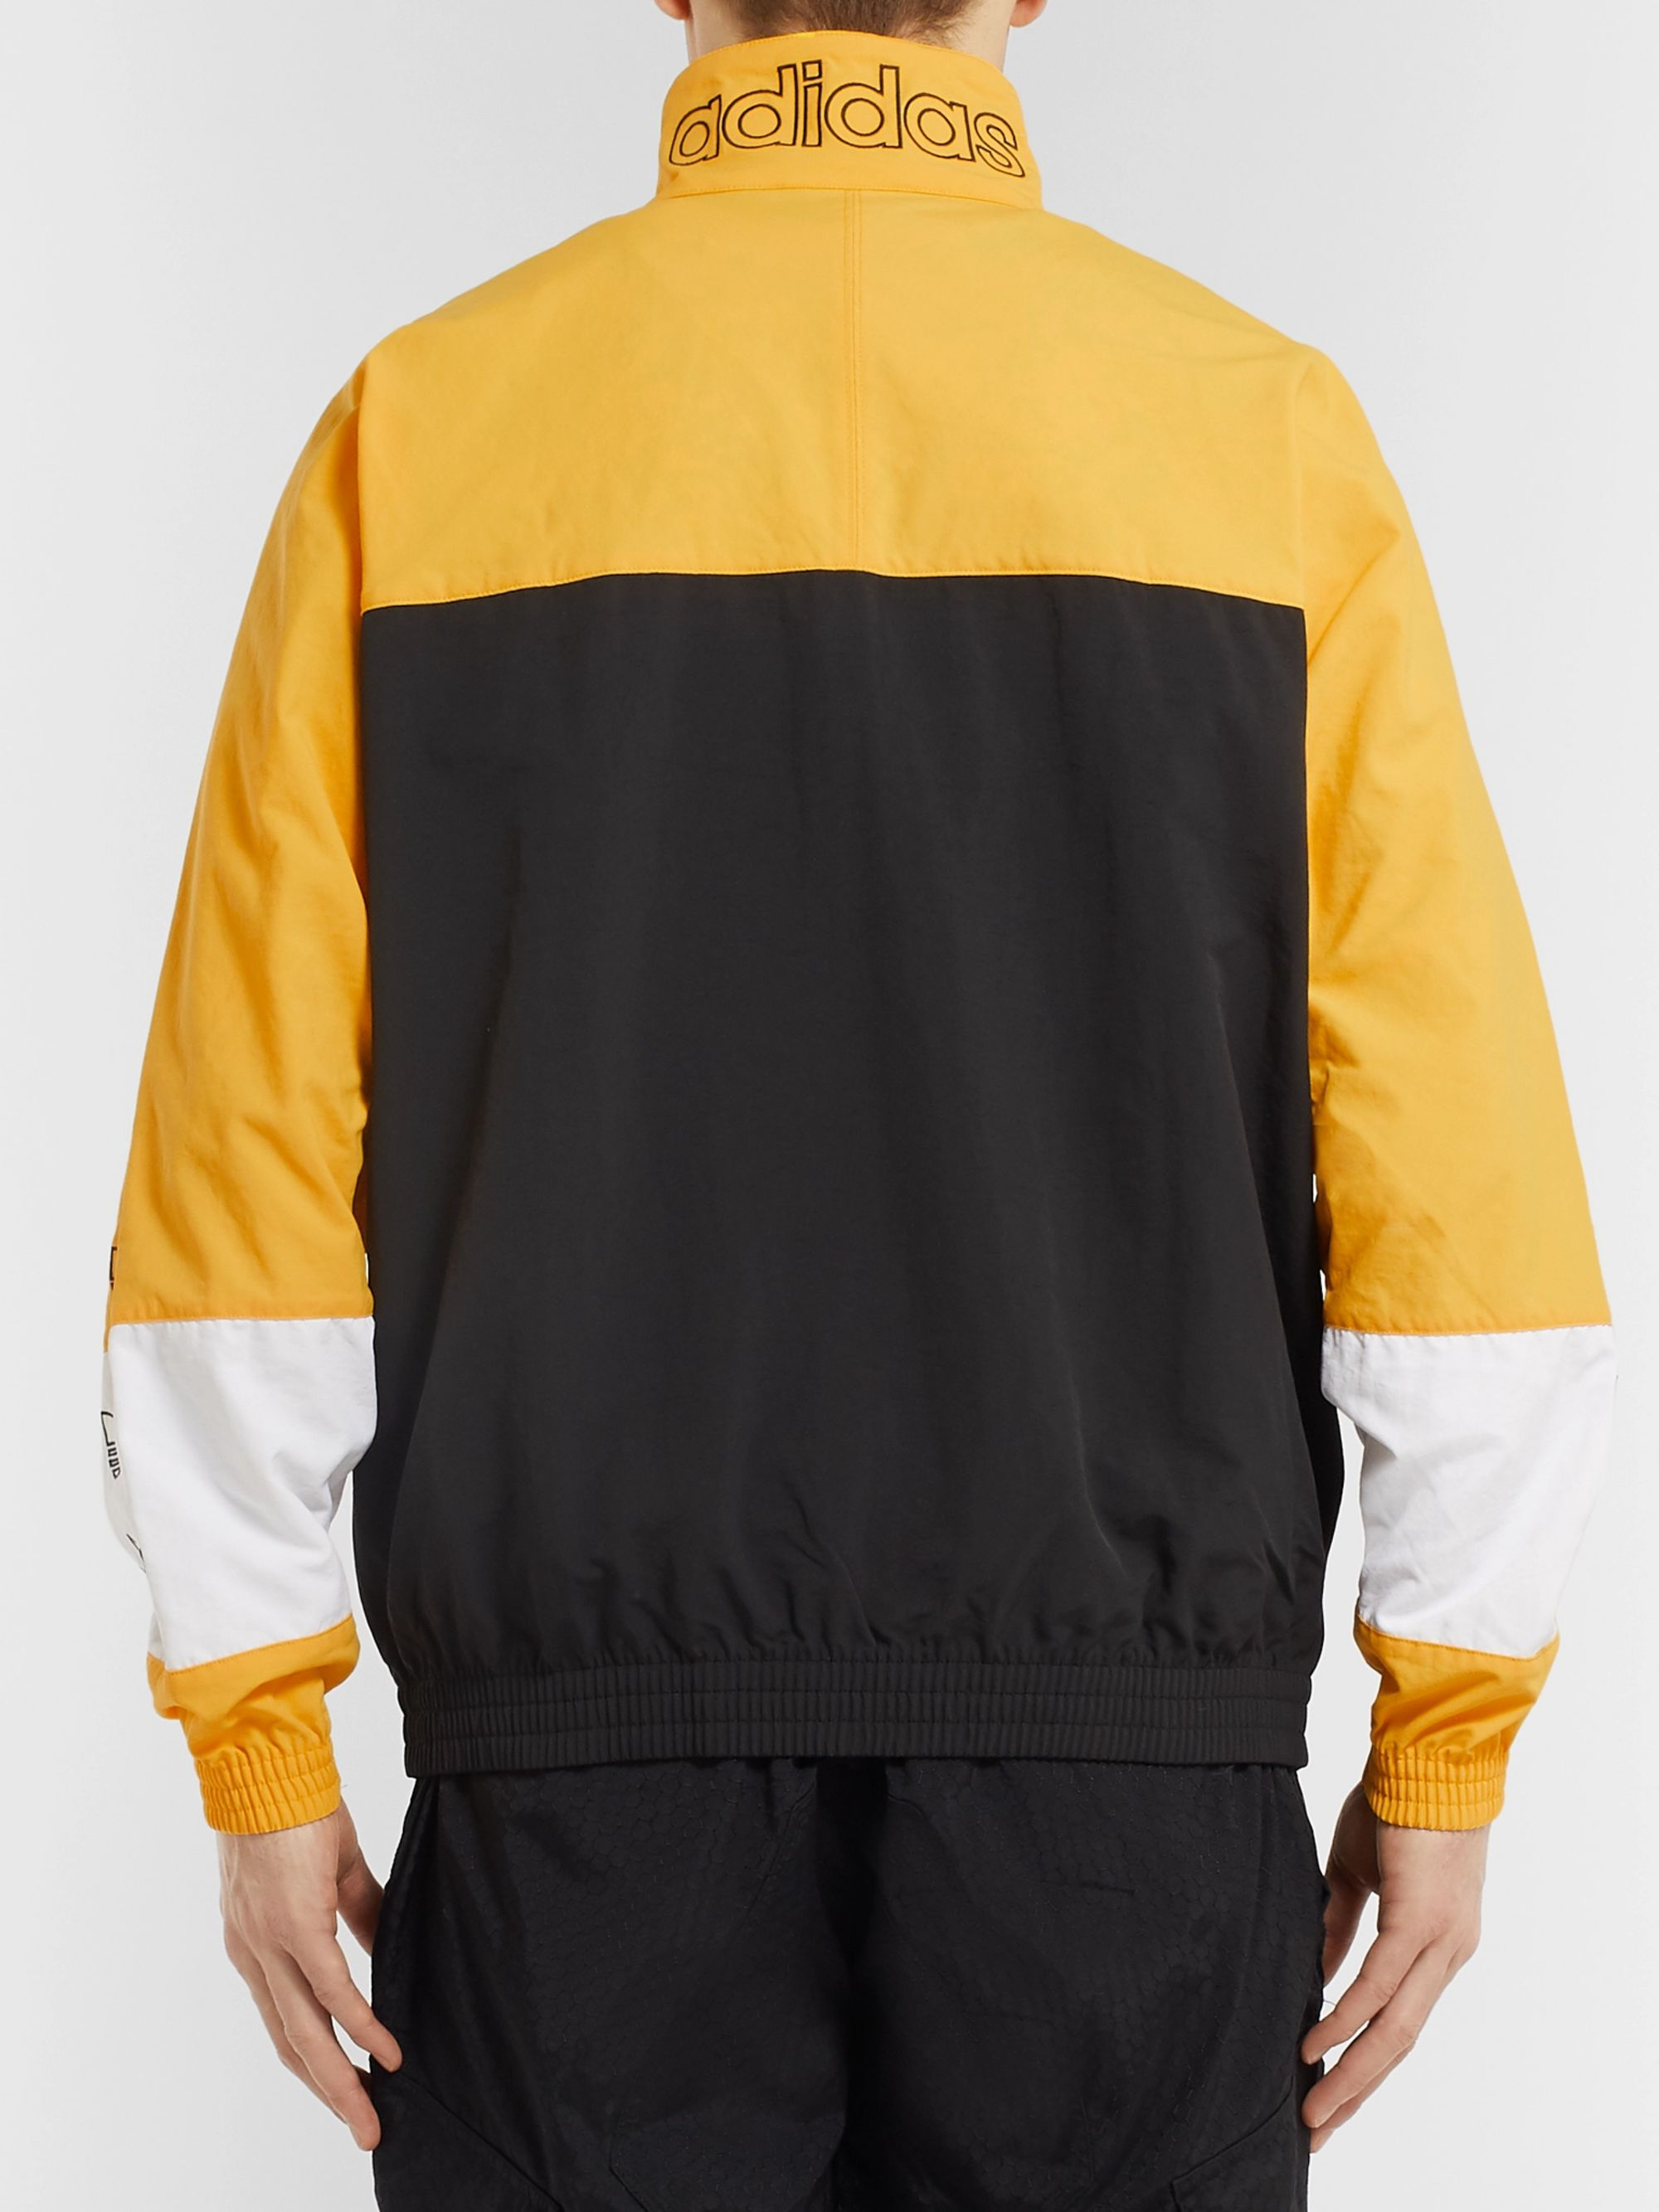 adidas Originals Colour Block Checked Shell Jacket